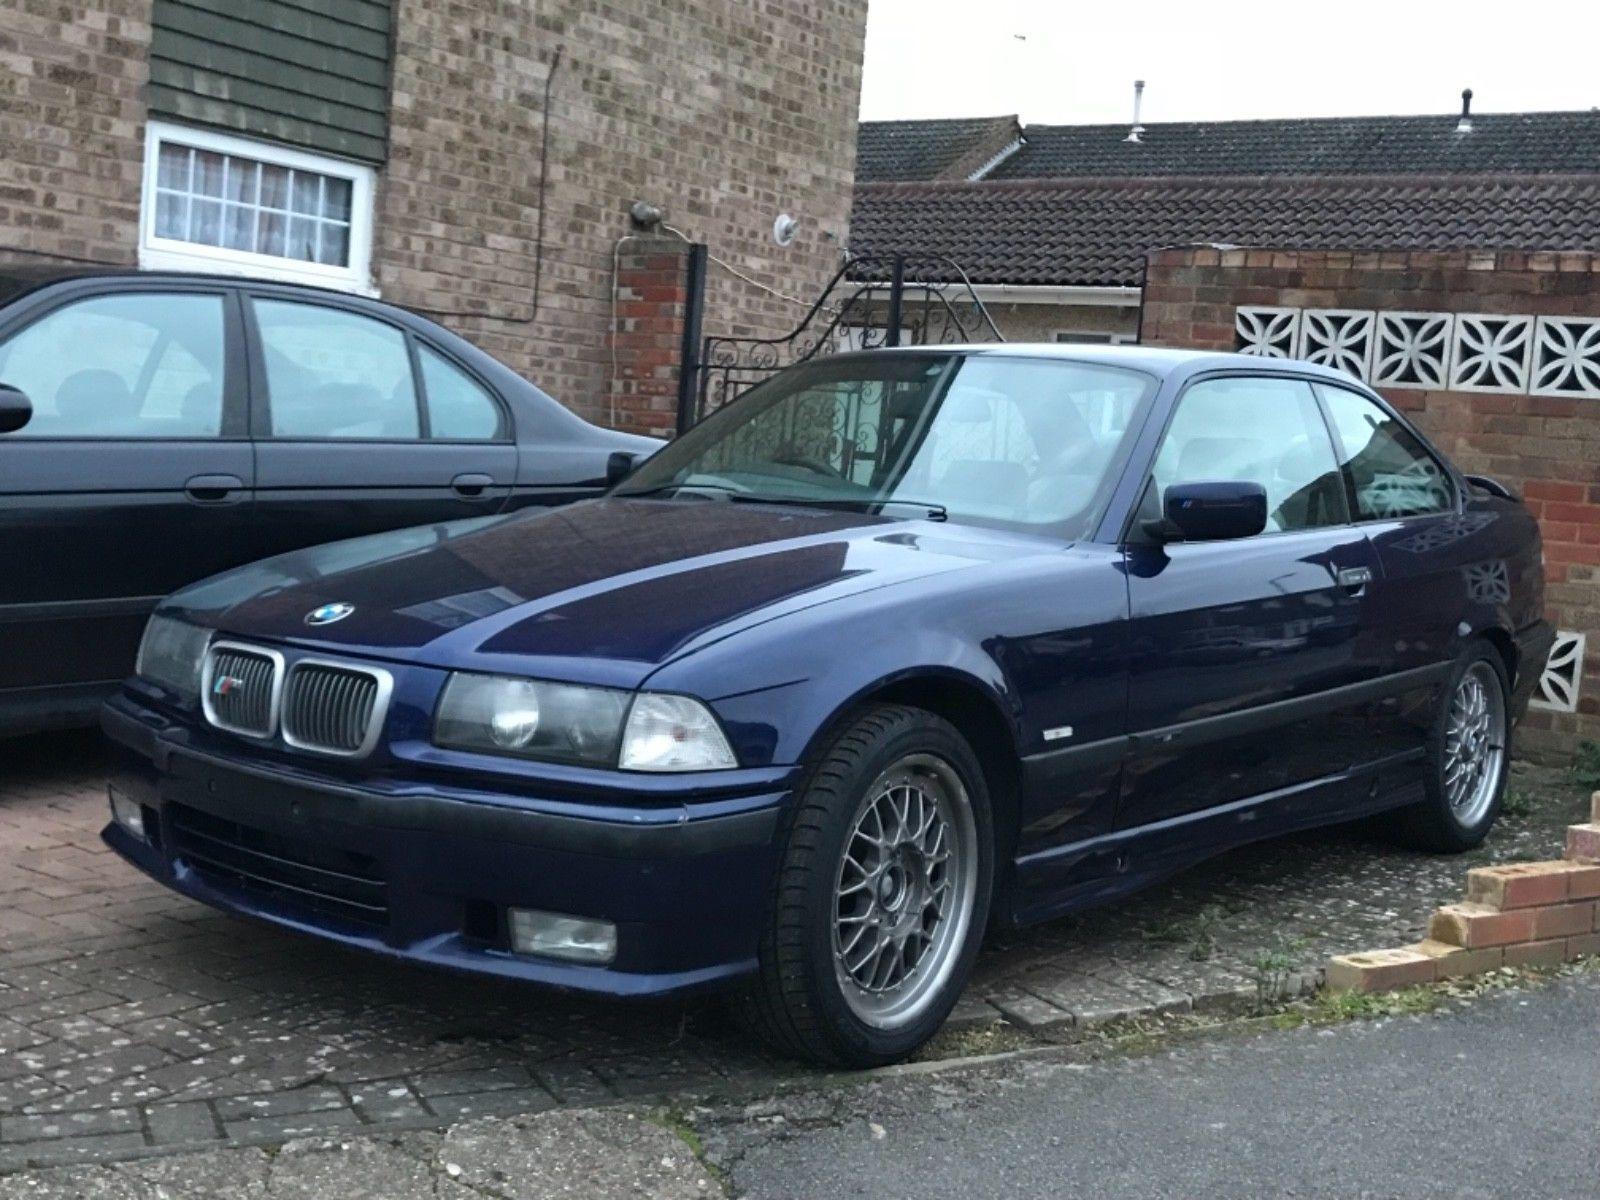 eBay BMW 328i SPORT 1997 MONTREAL BLUE 118k MILES AUTOMATIC E36